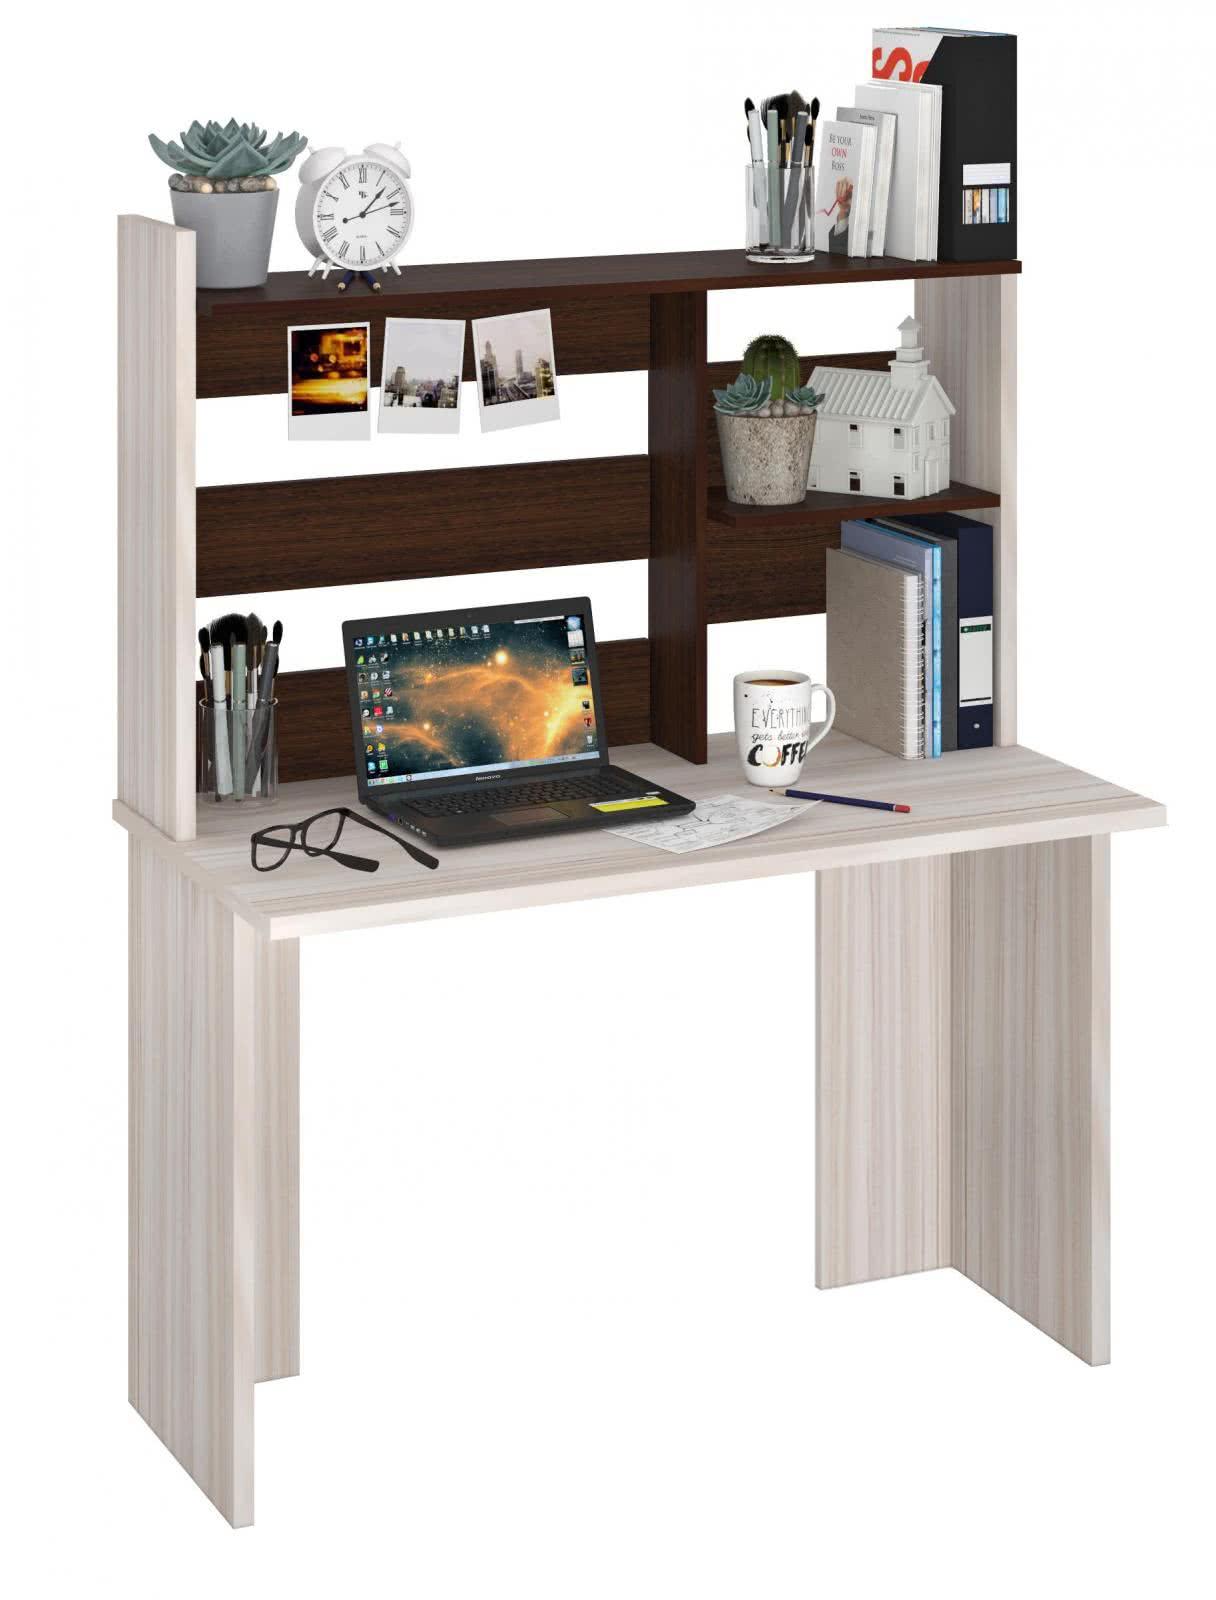 Компьютерный стол Мэрдэс СКЛ-Прям120(без тумбы)+ НКЛ-120